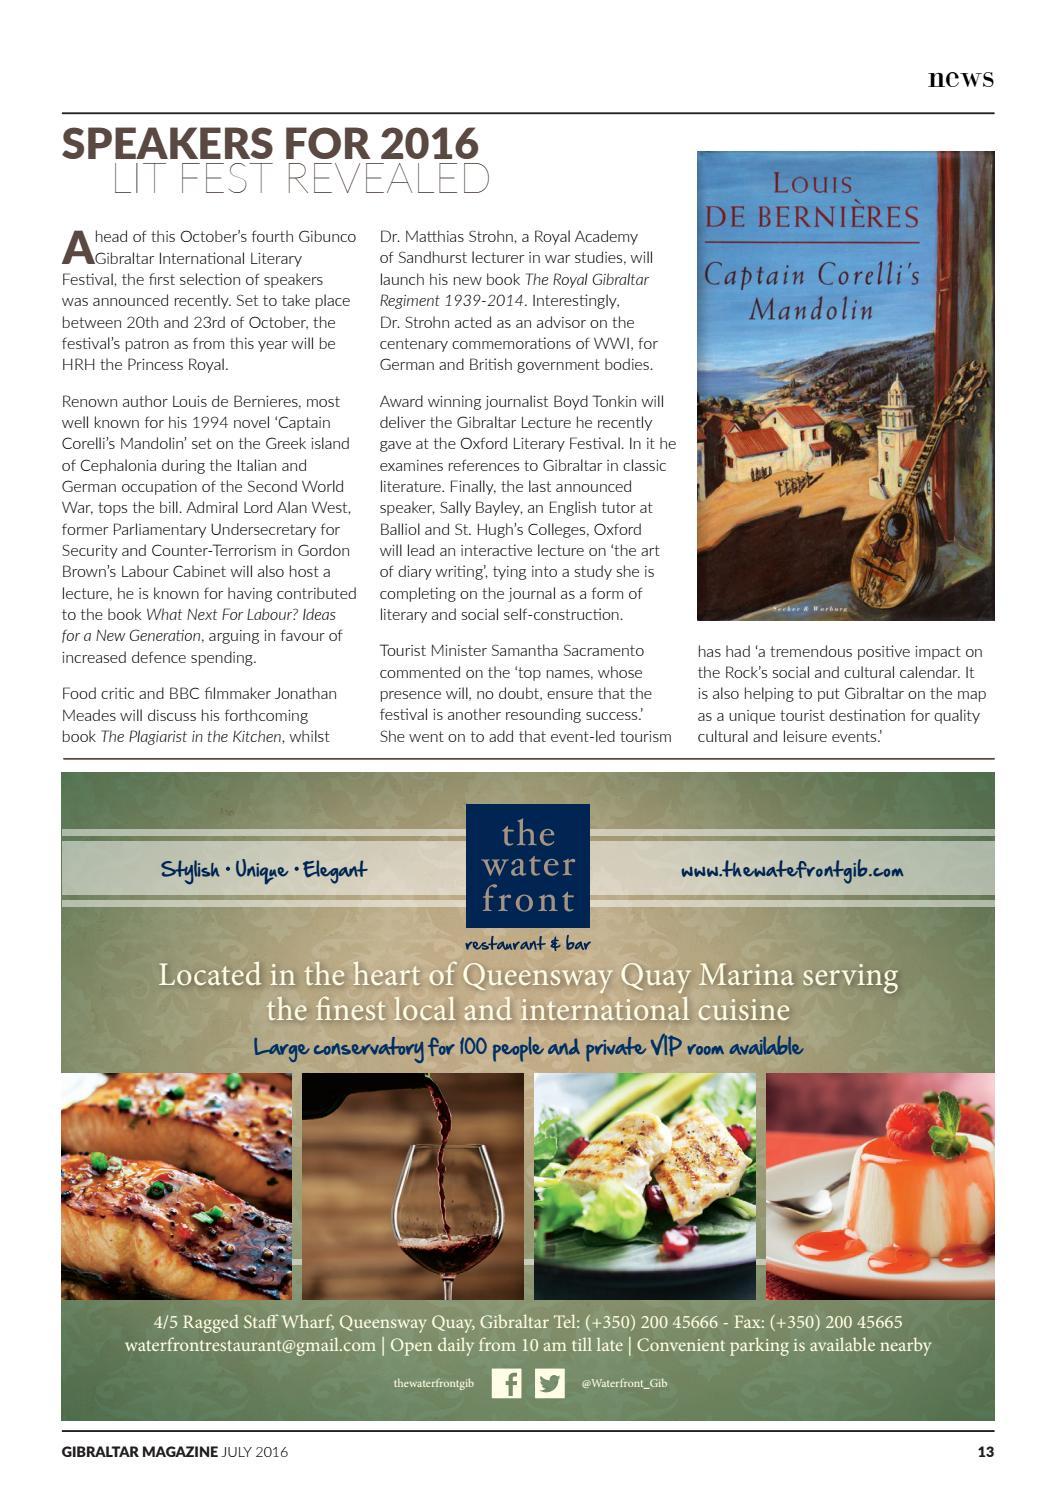 The Gibraltar Magazine - July 2016 by Rock Publishing Ltd - issuu